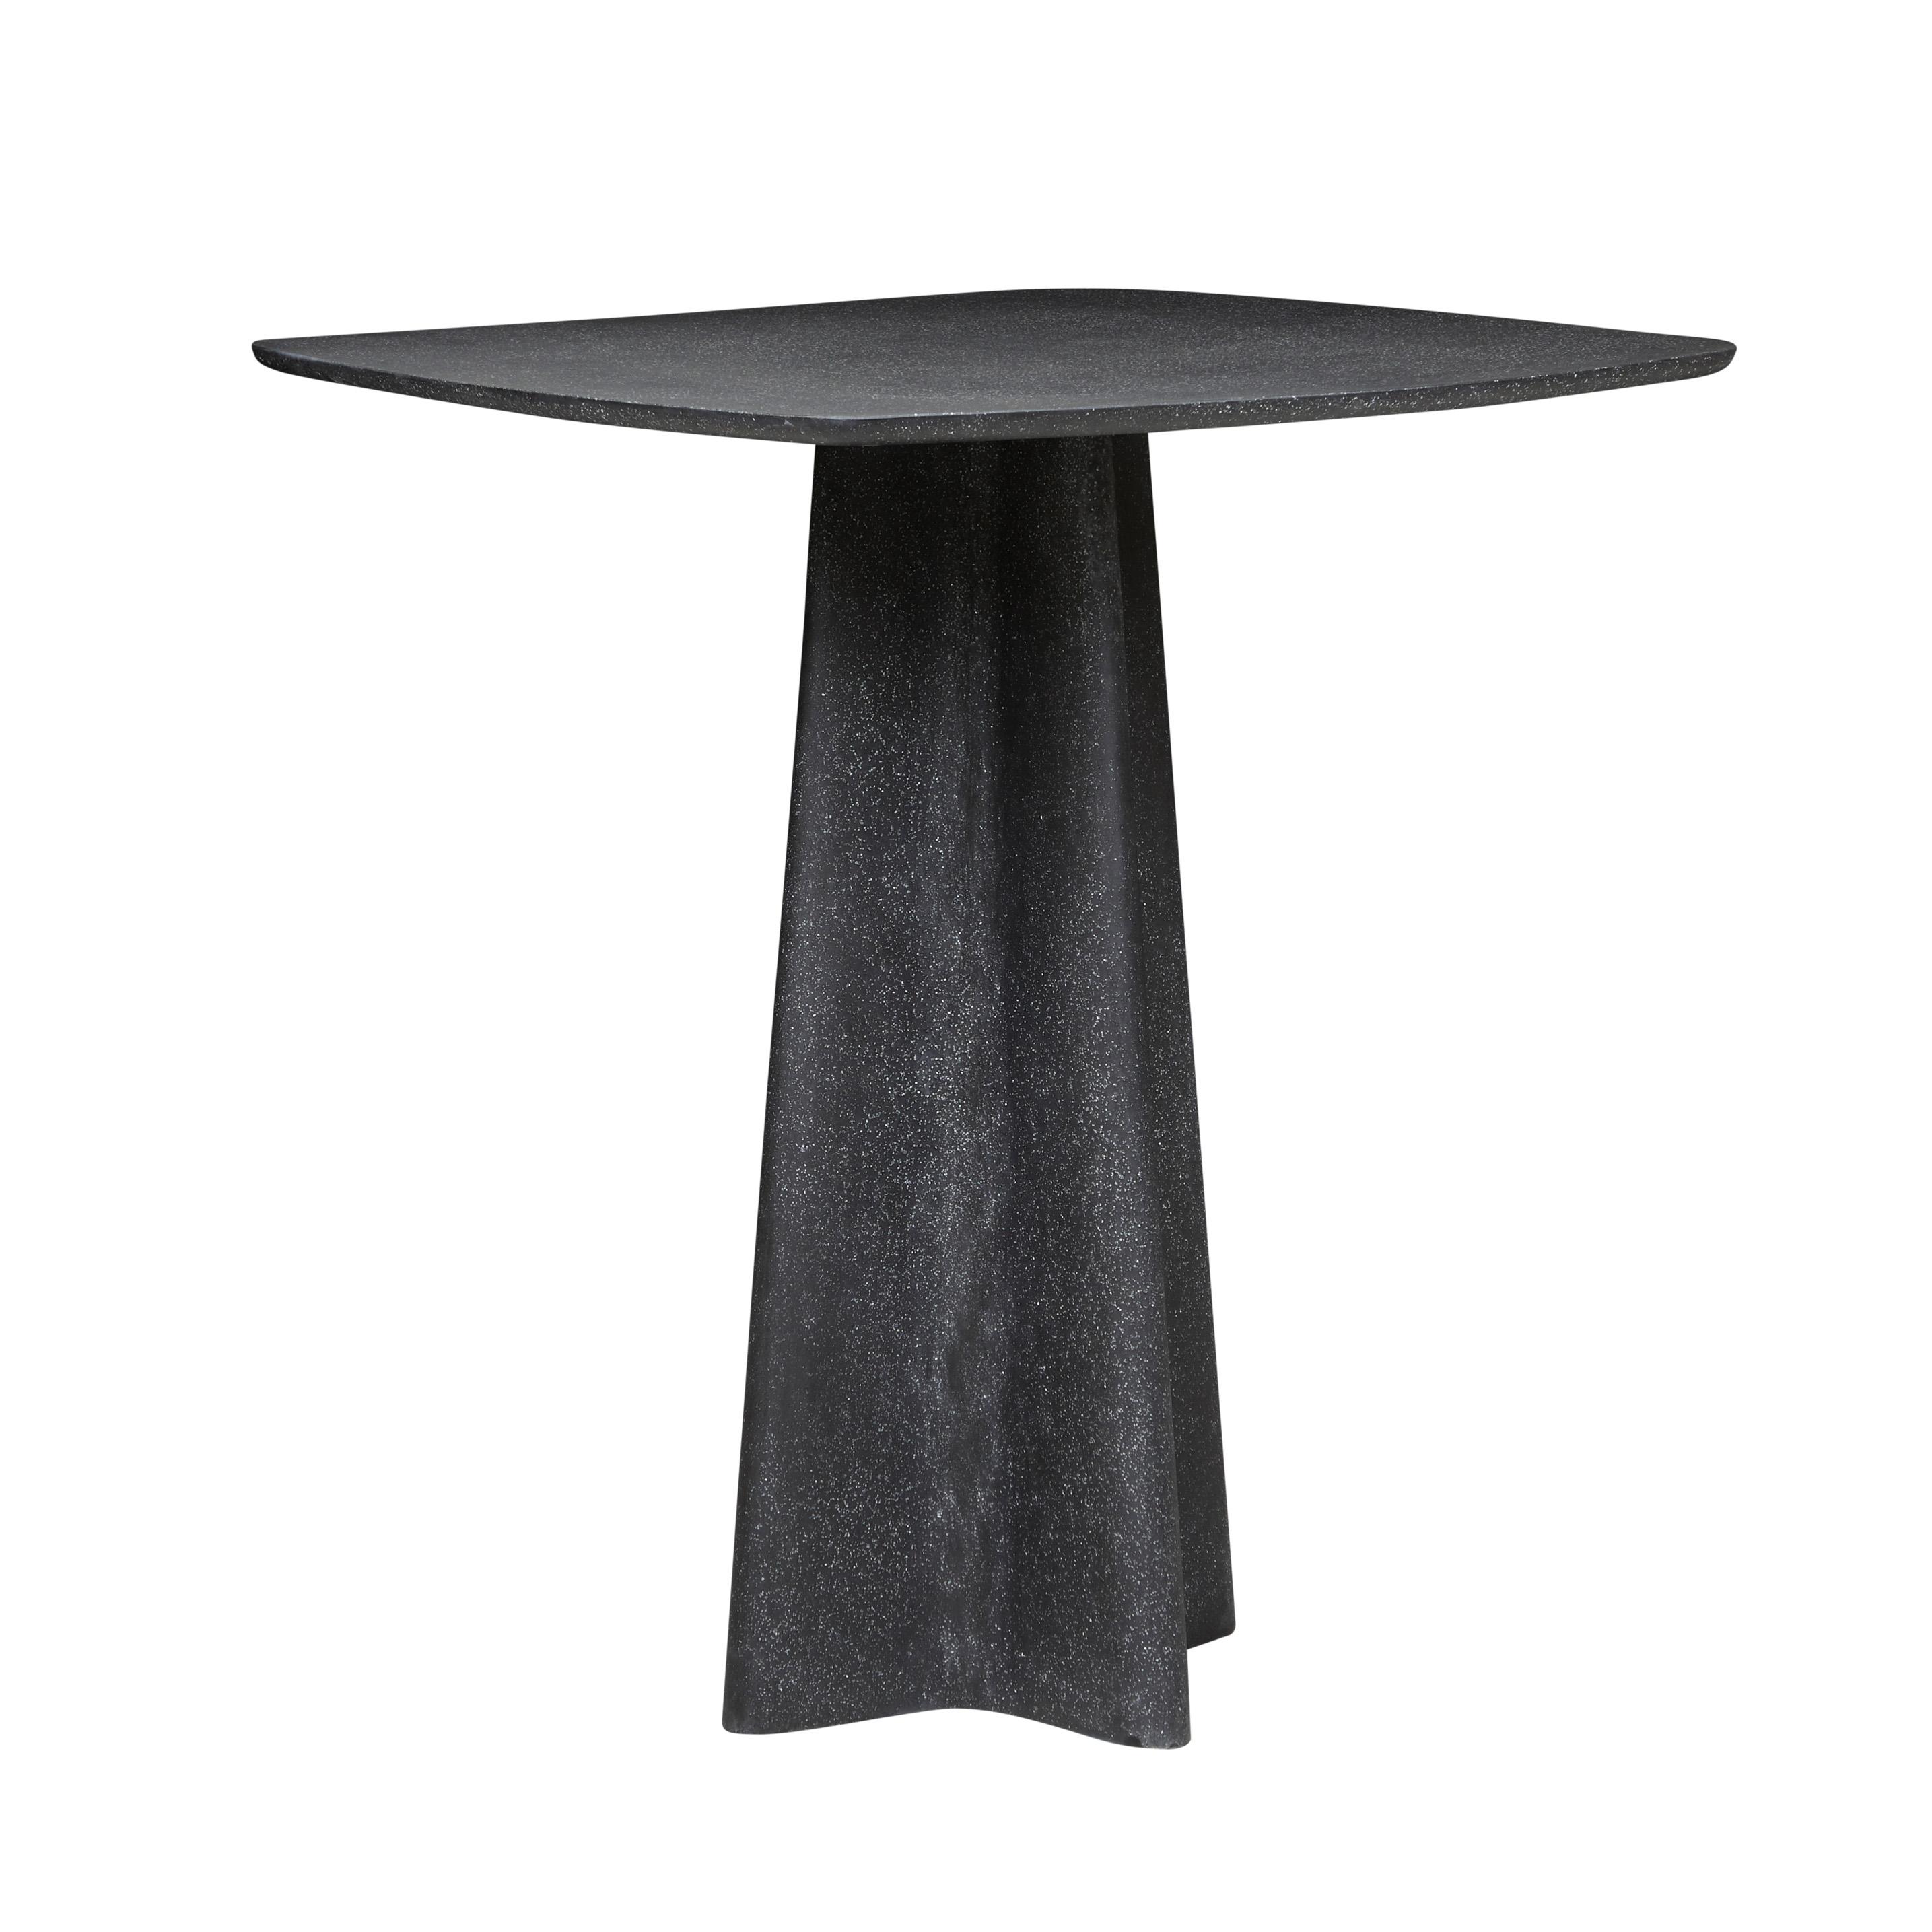 Furniture Hero-Images Dining-Tables livorno-bar-01